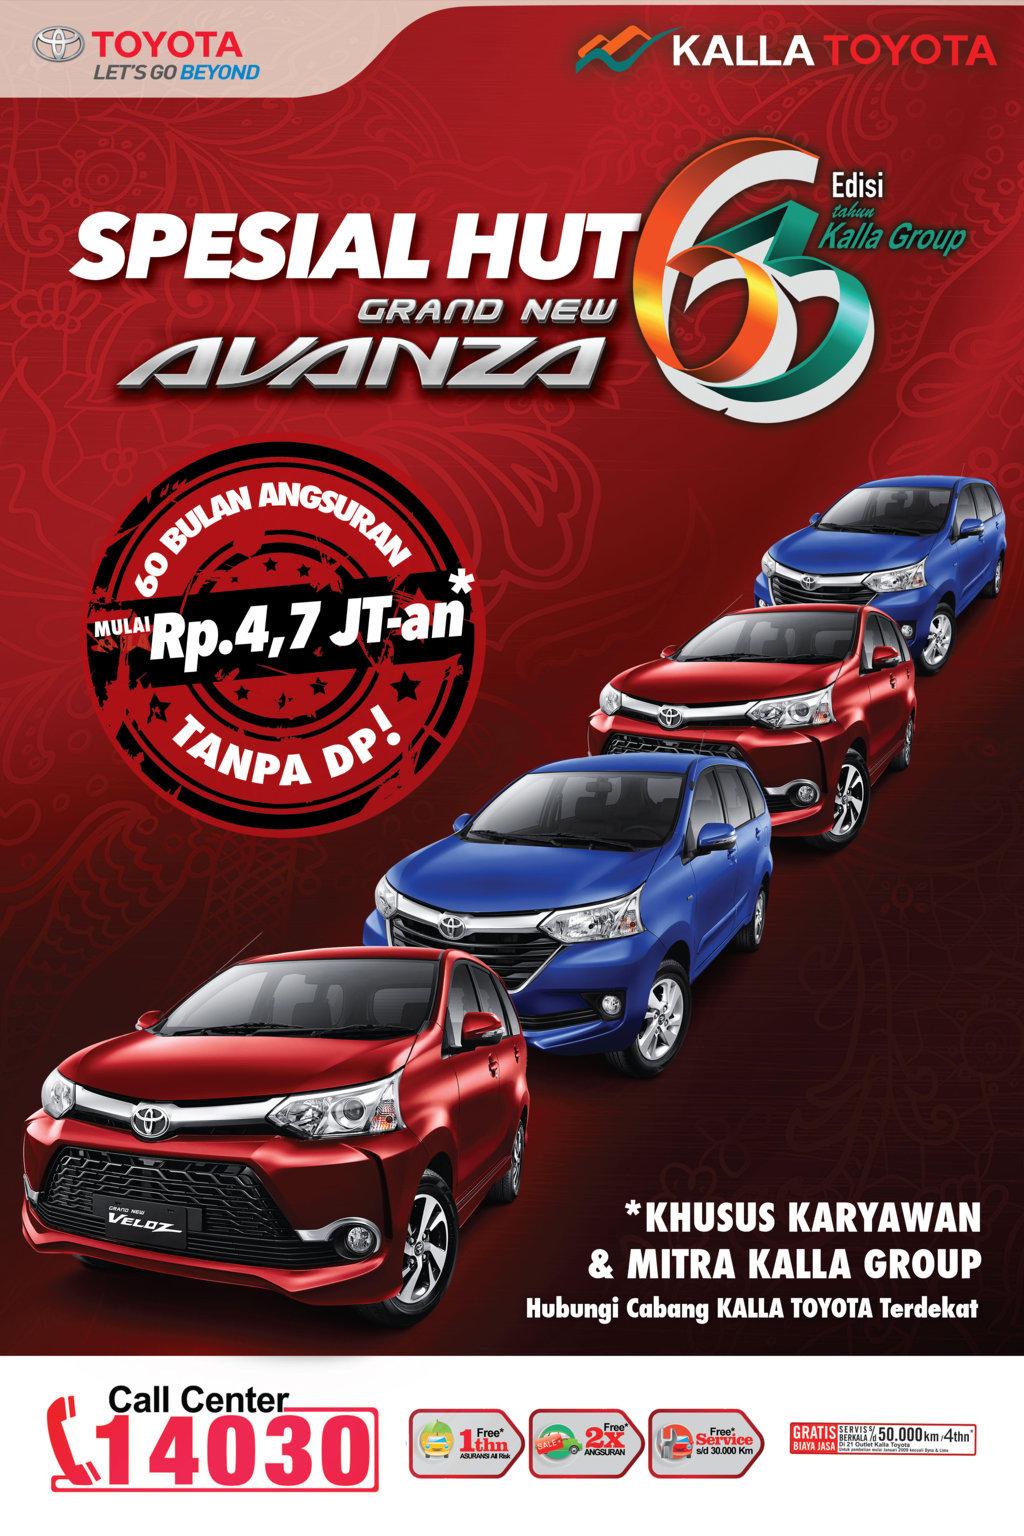 Harga Grand New Avanza Makassar Interior Innova Venturer Pt Hadji Kalla Toyota 2016 Info Promo Diskon Kredit Ulang Tahun 2015